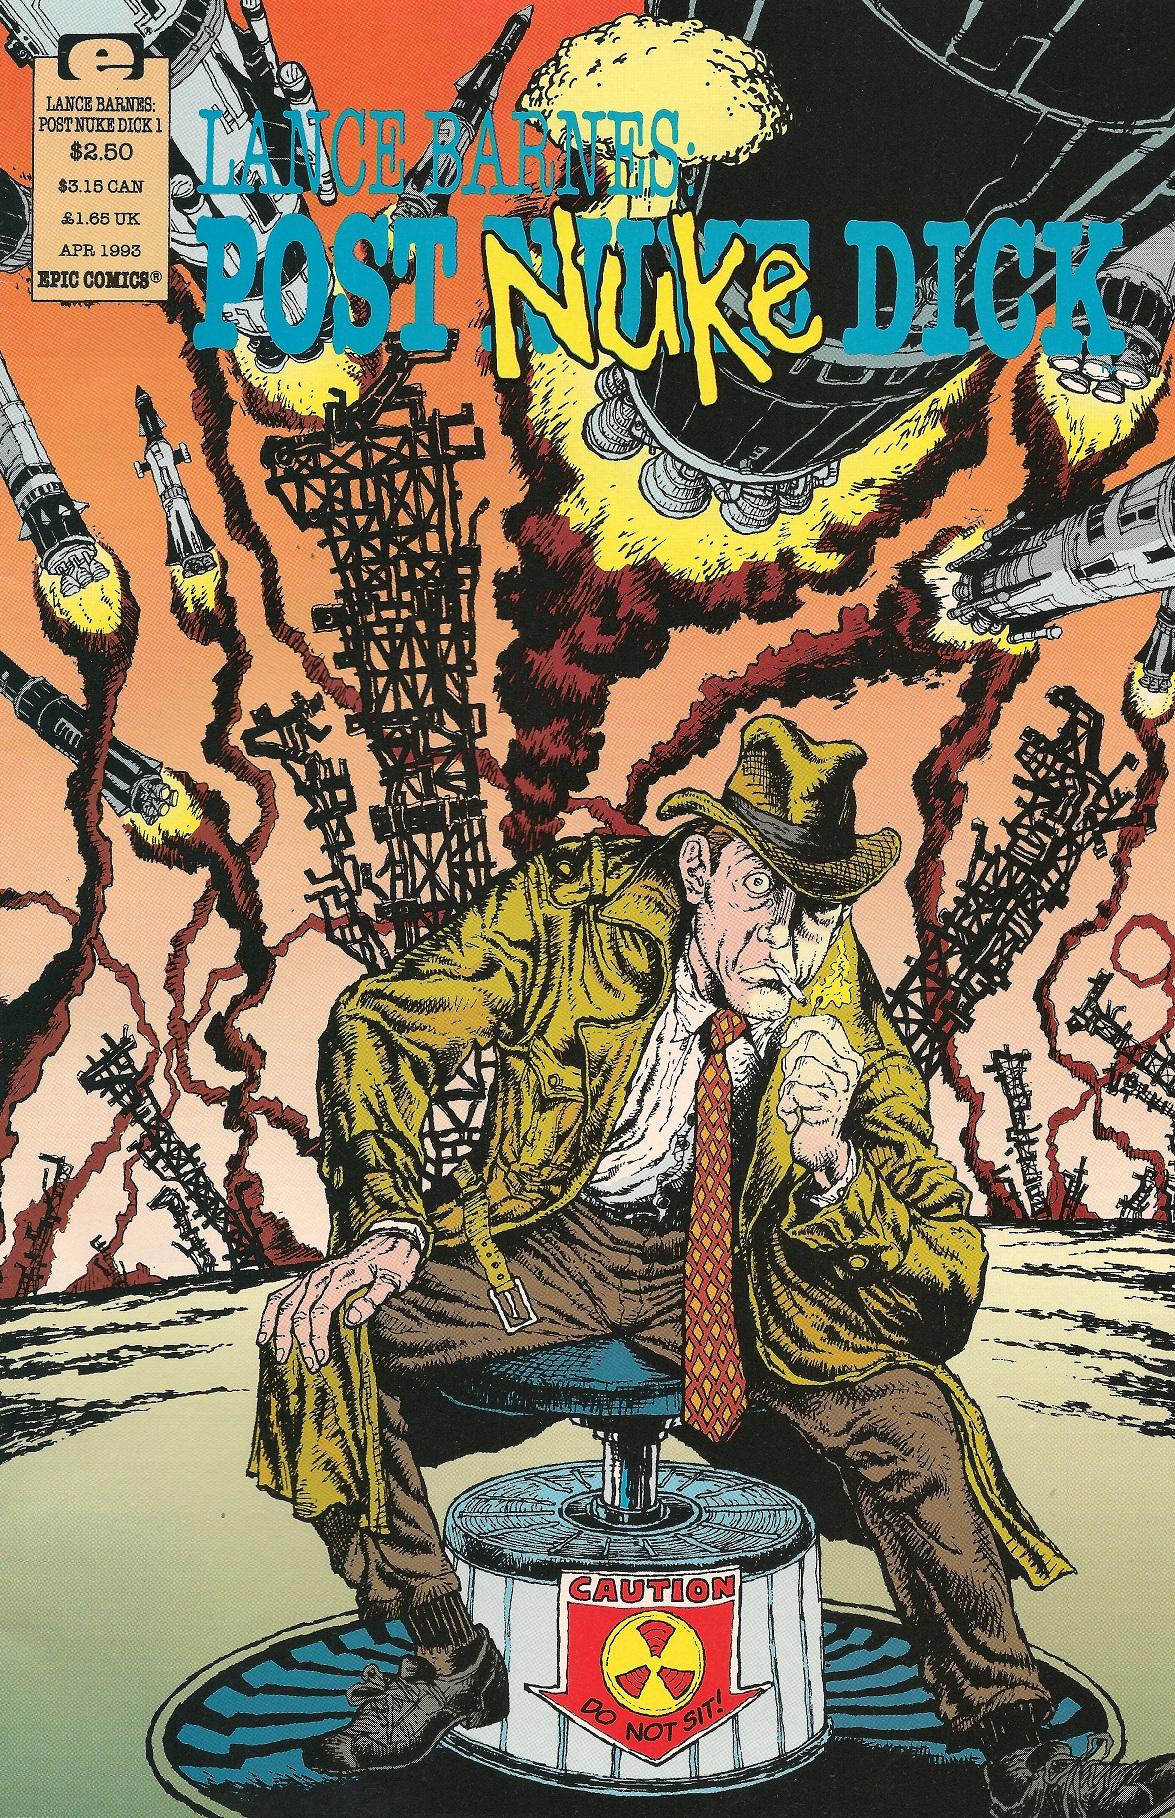 Lance Barnes: Post Nuke Dick Vol 1